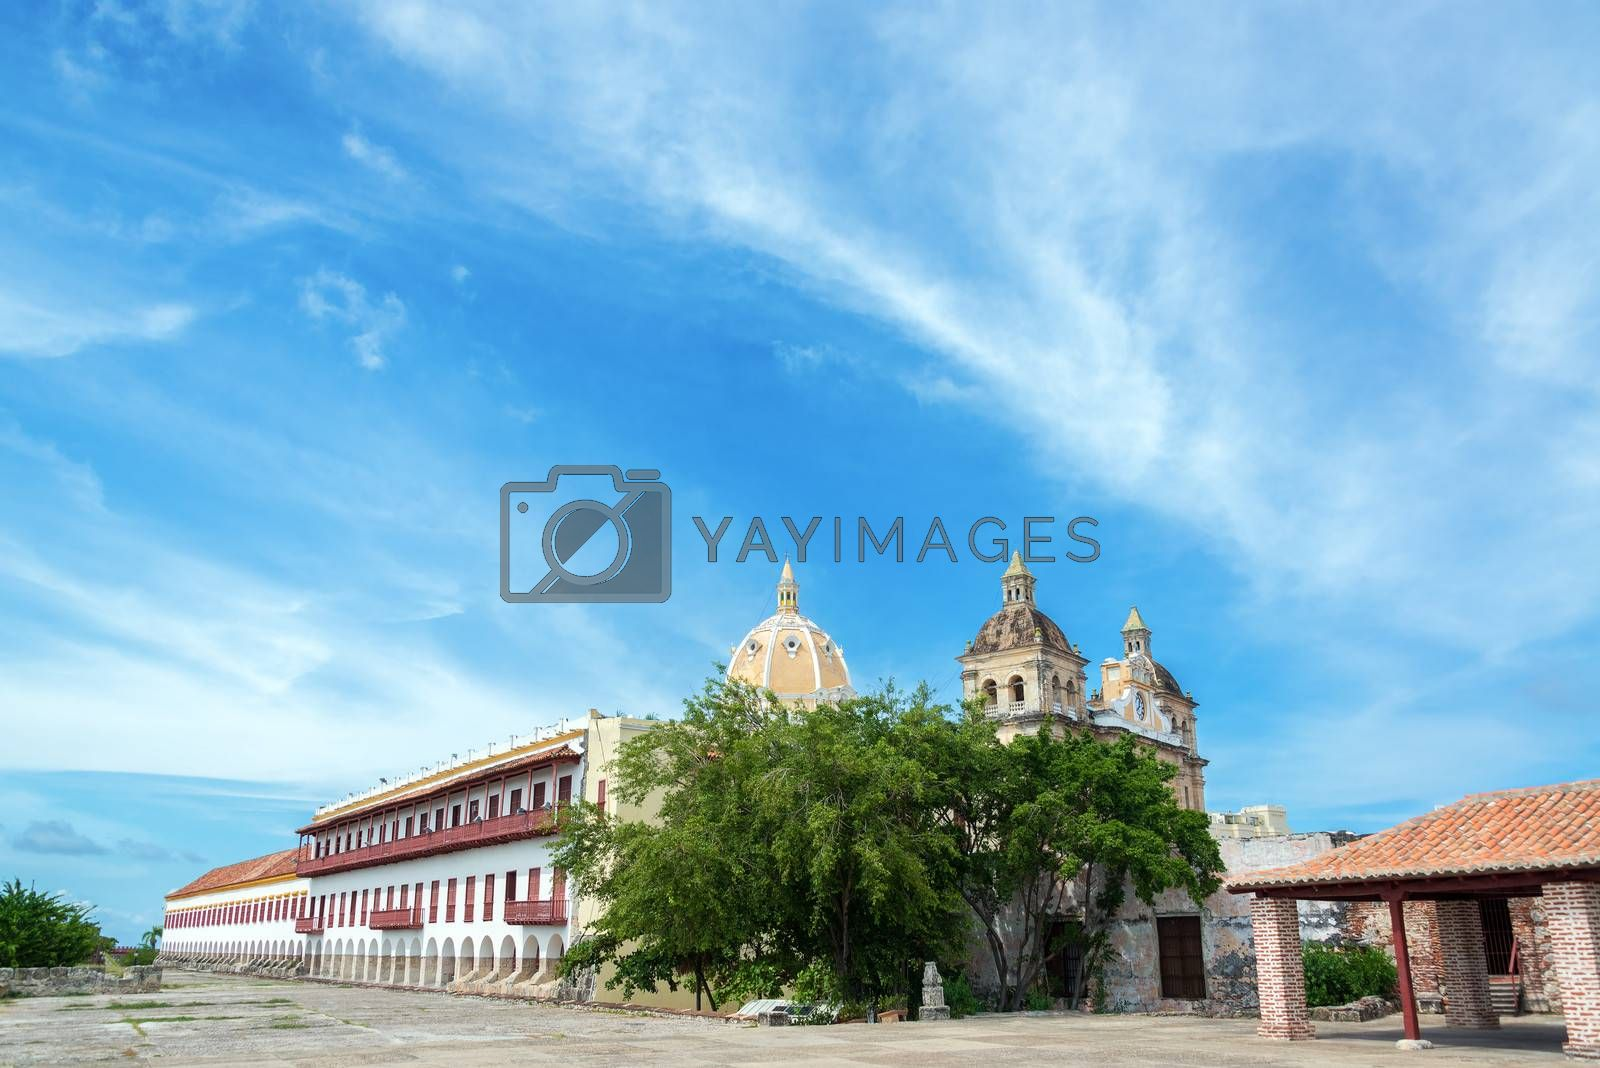 Royalty free image of Cartagena View by jkraft5